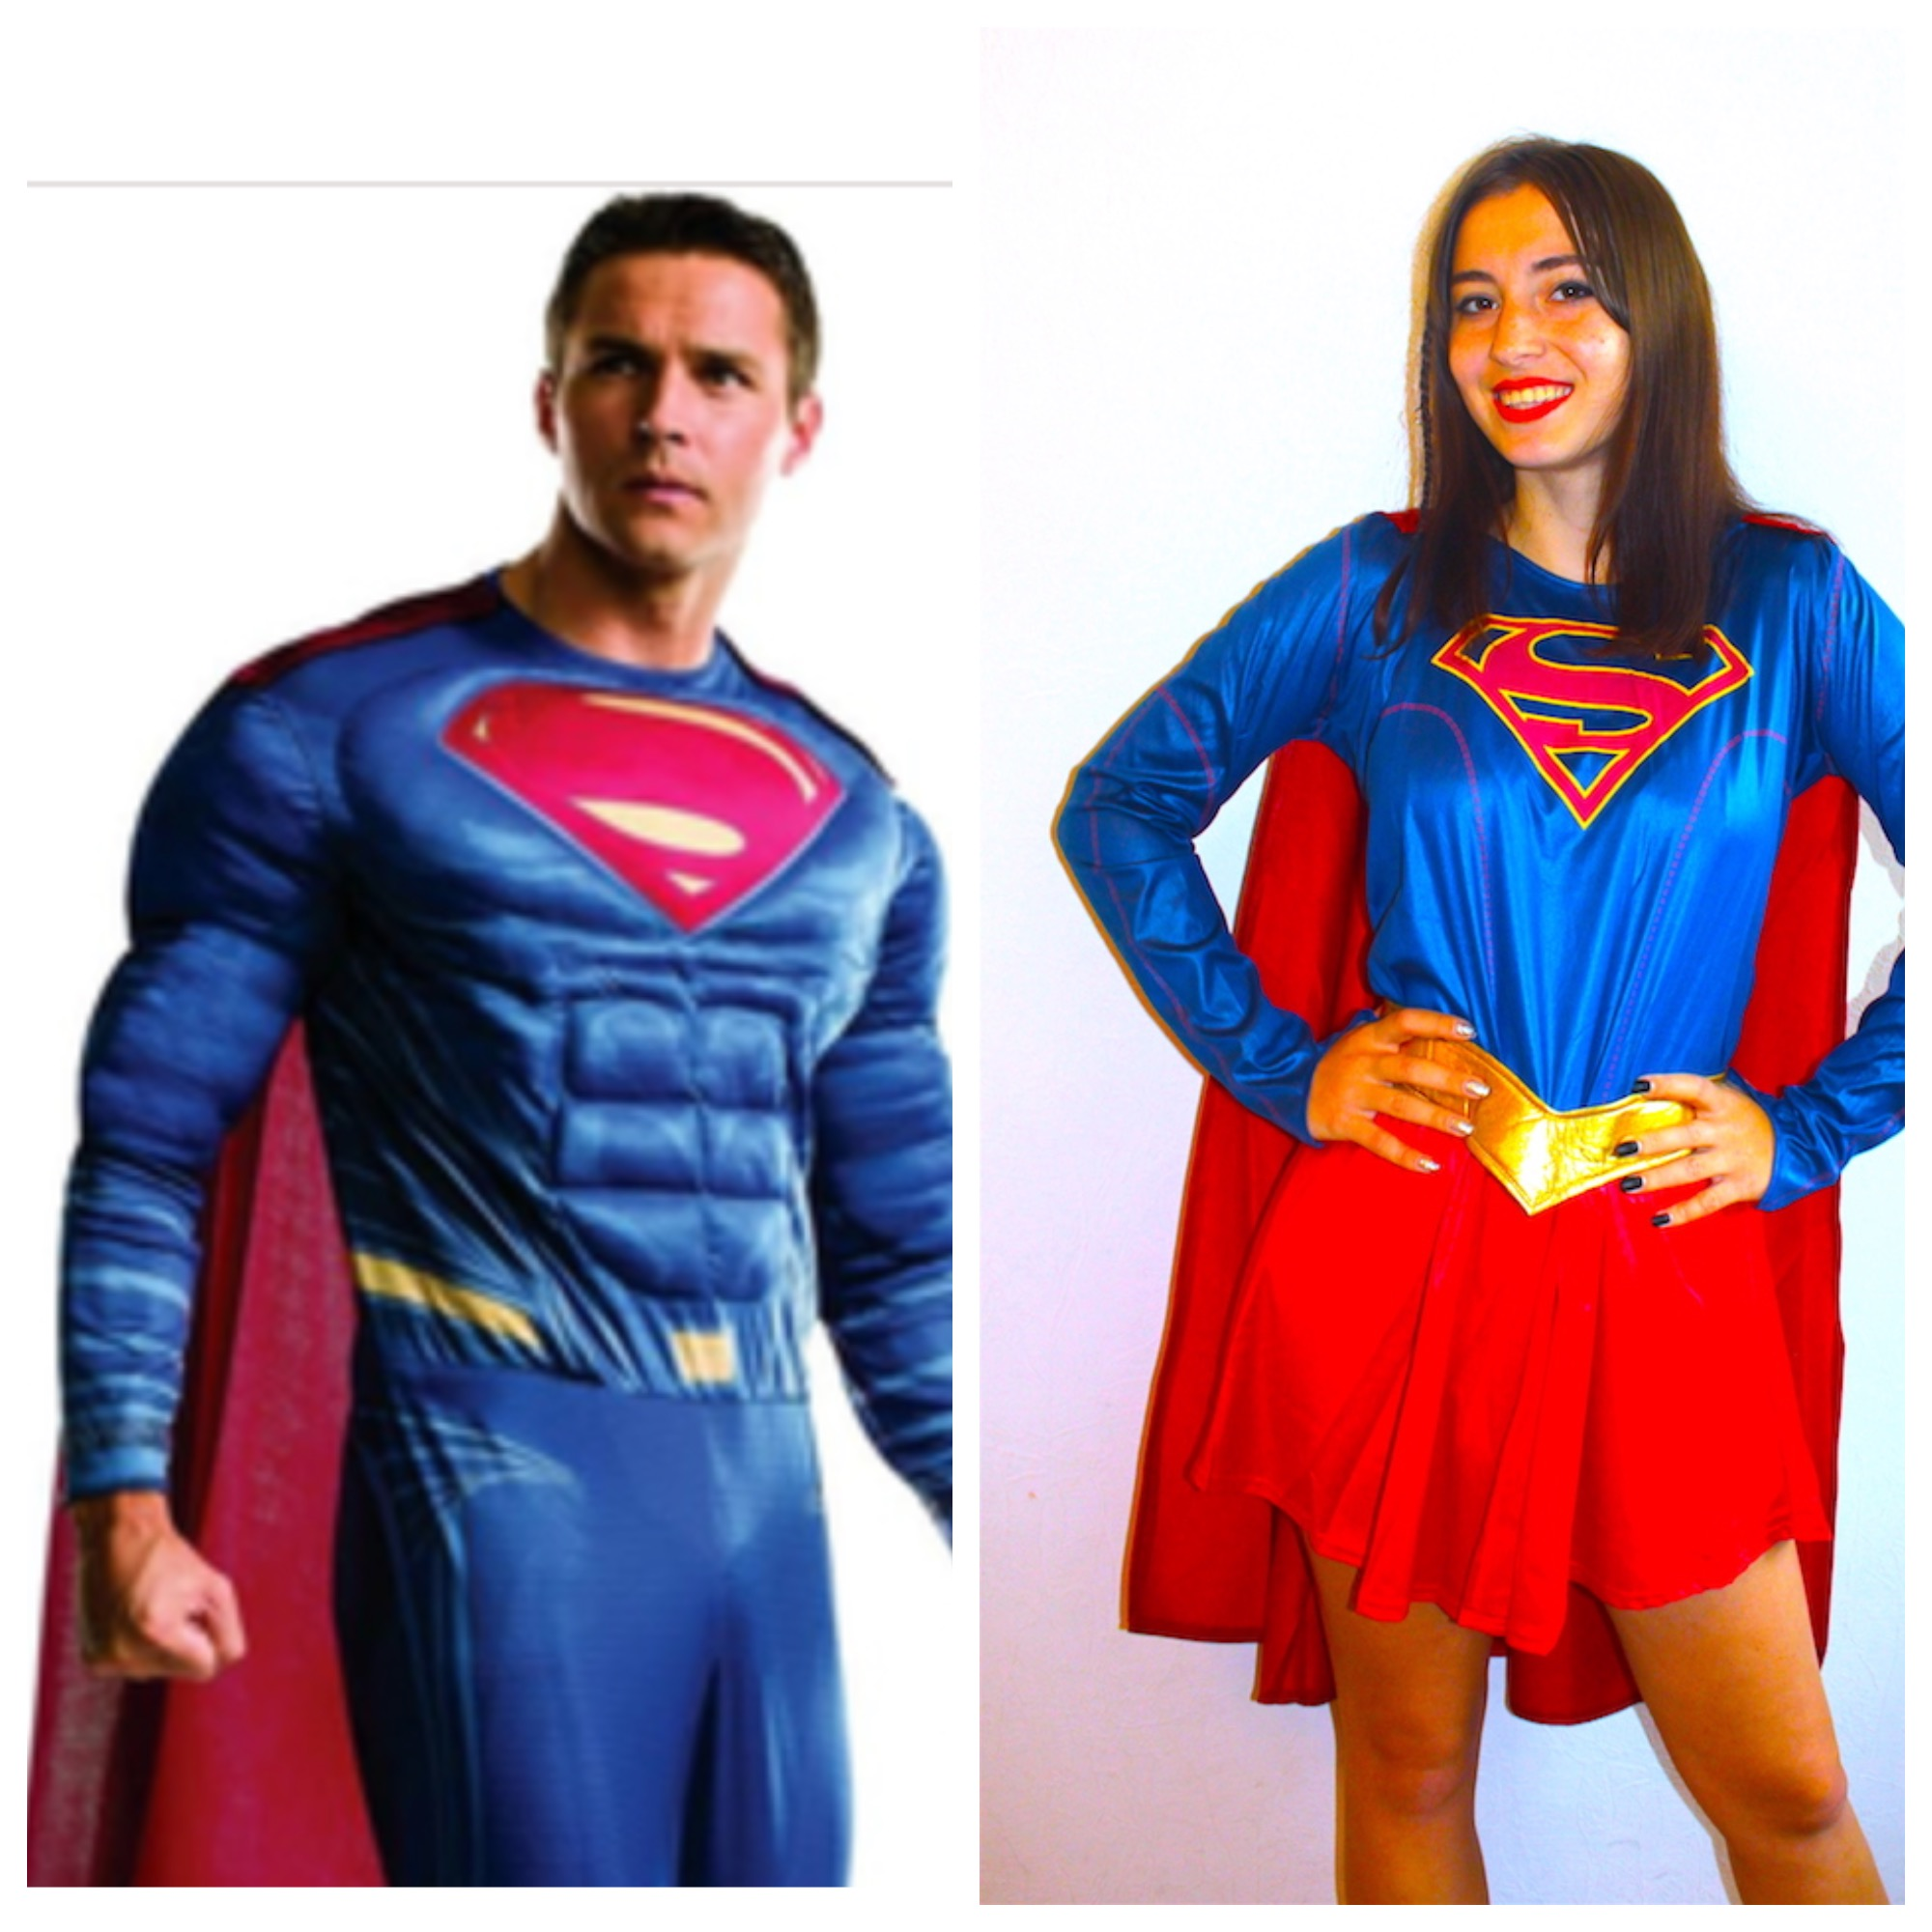 Аниматоры Супермен и Супервумен Одесса